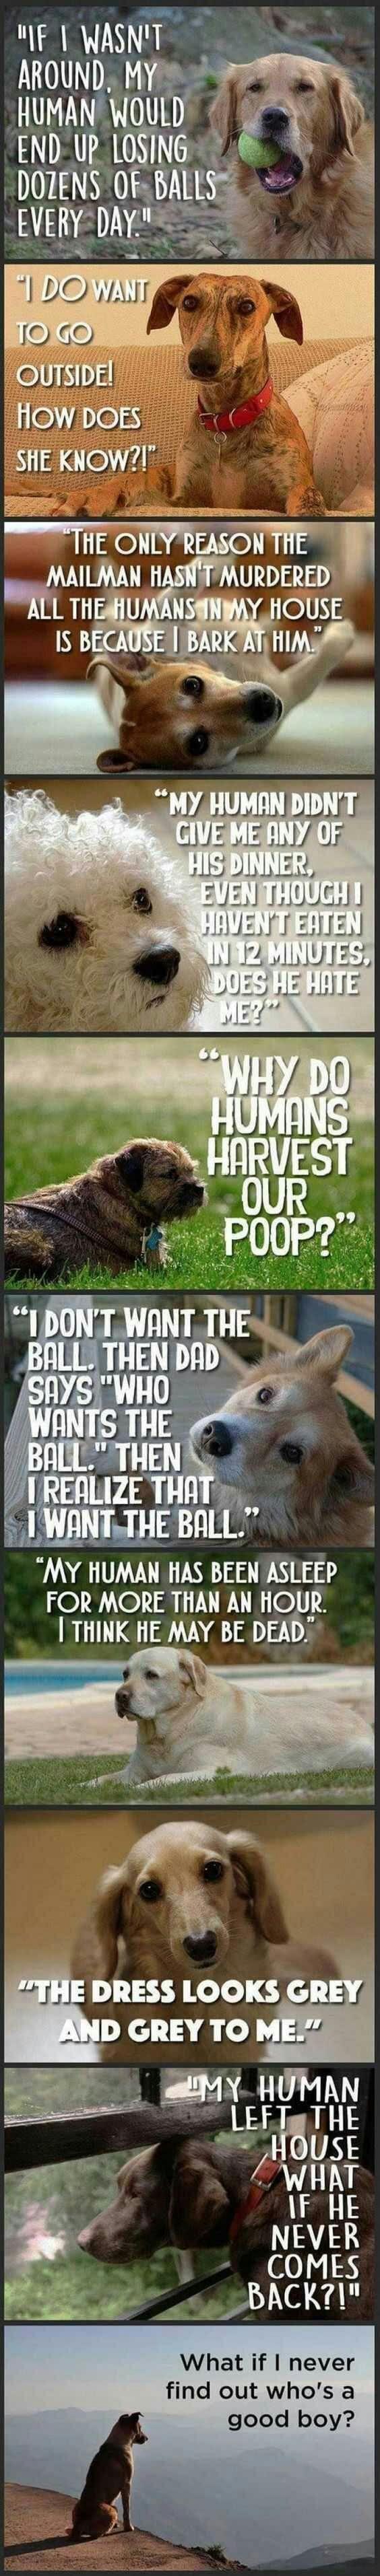 Mysterious doggos